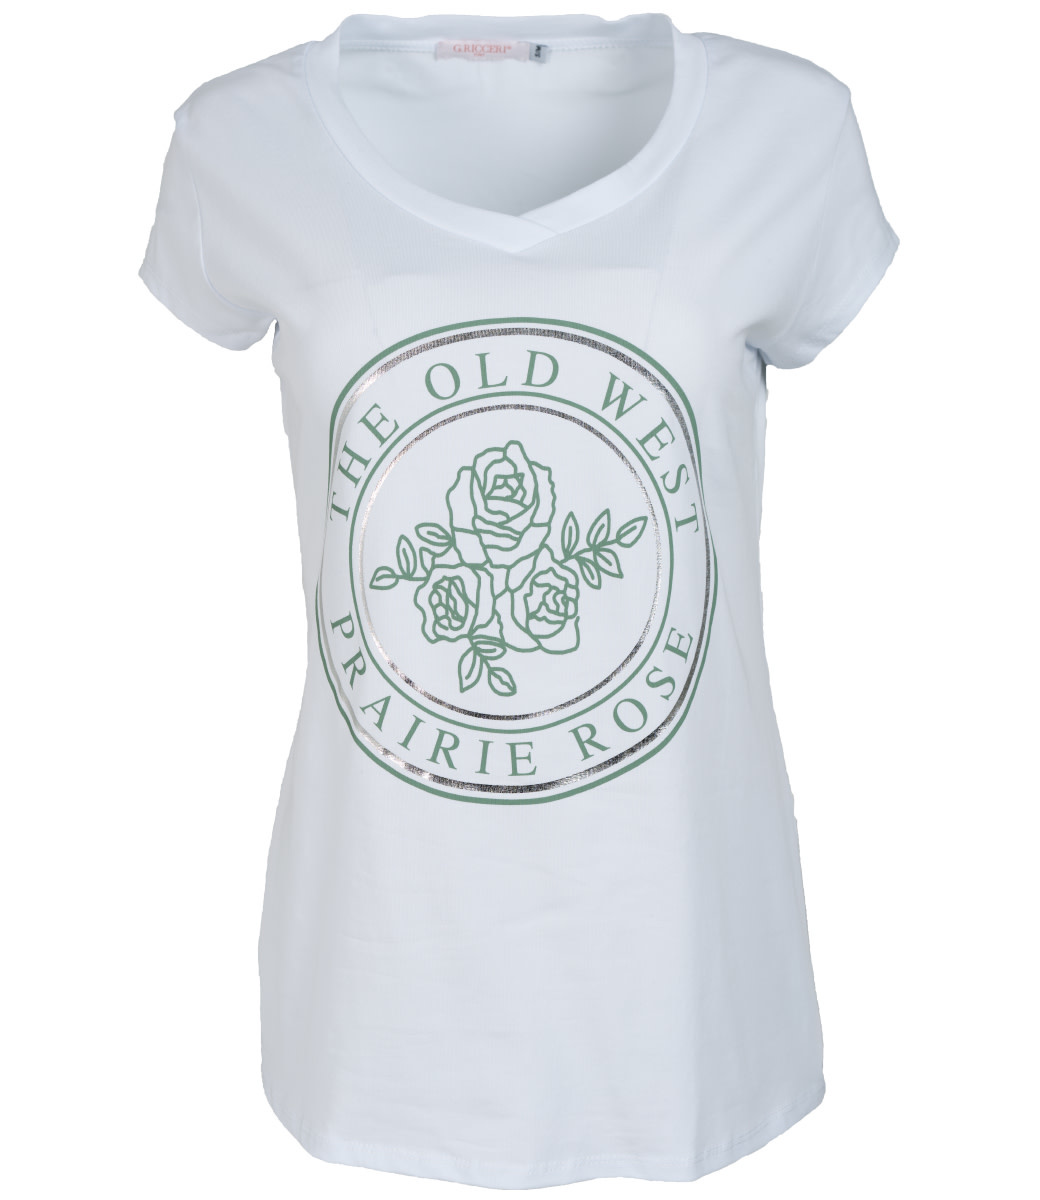 Gemma Ricceri Shirt wit/groen old west